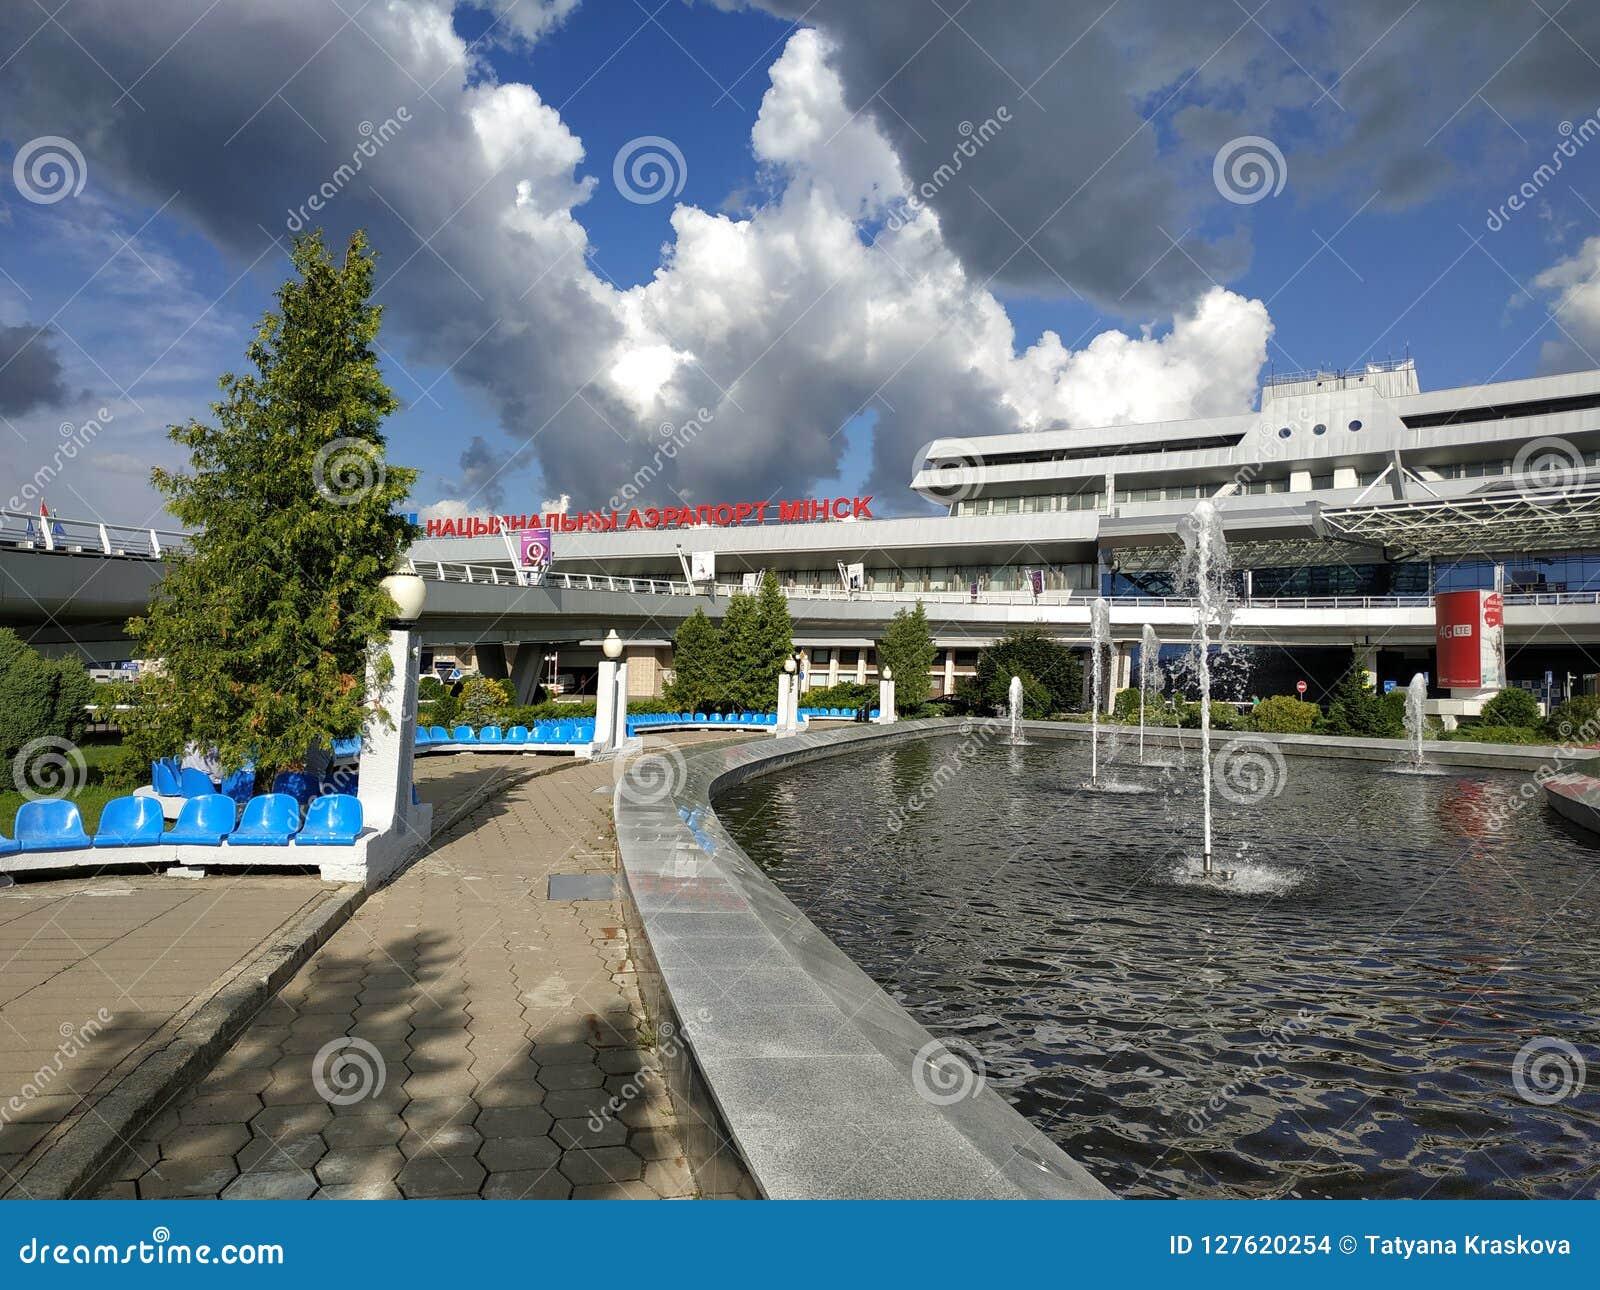 Minsk - National Airport